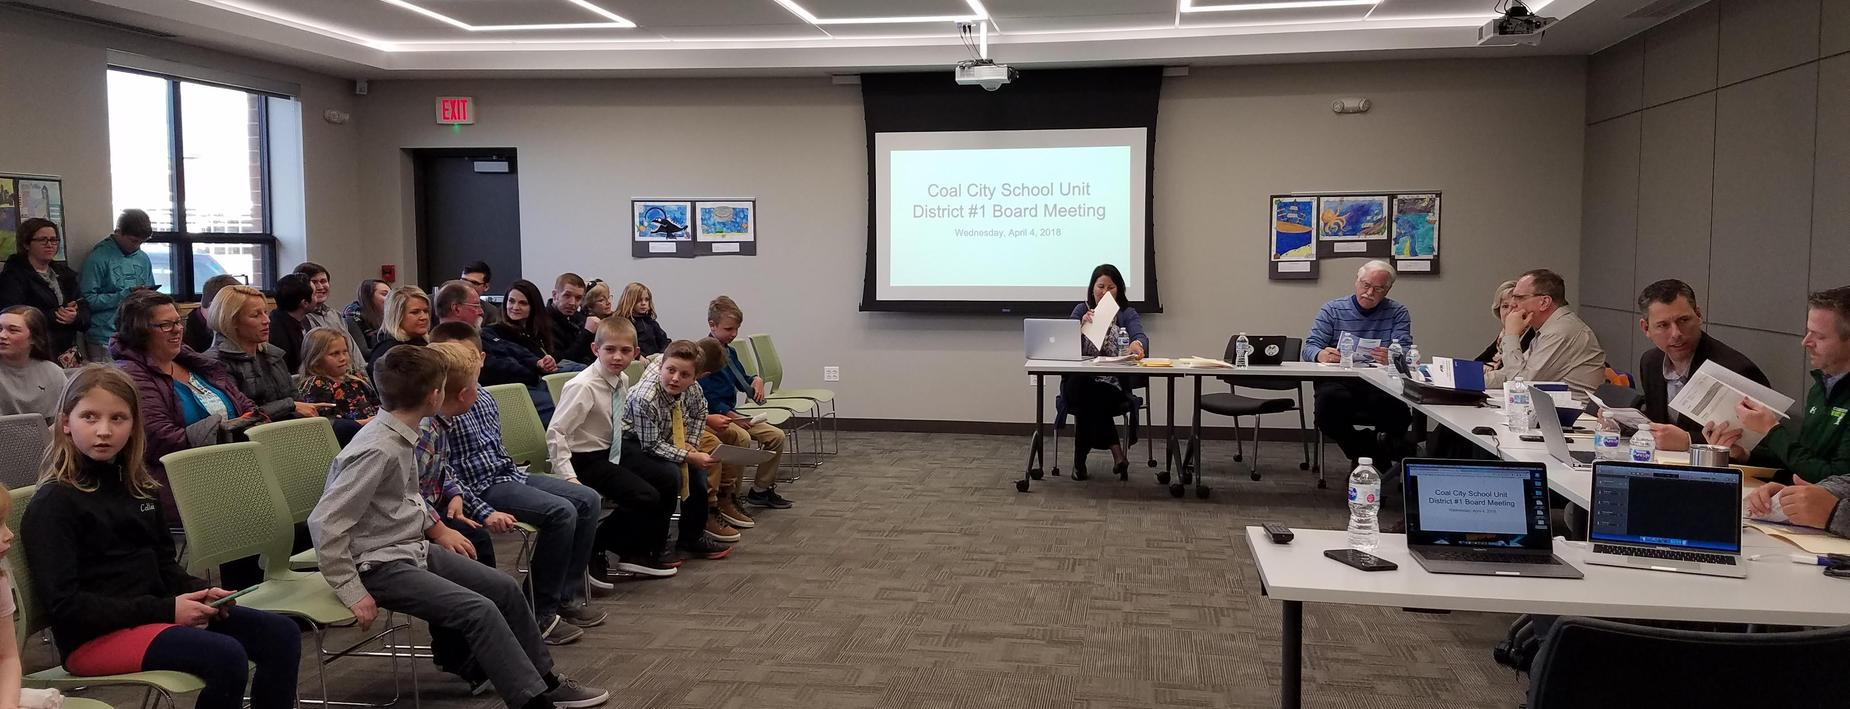 Board Meeting in April 2018